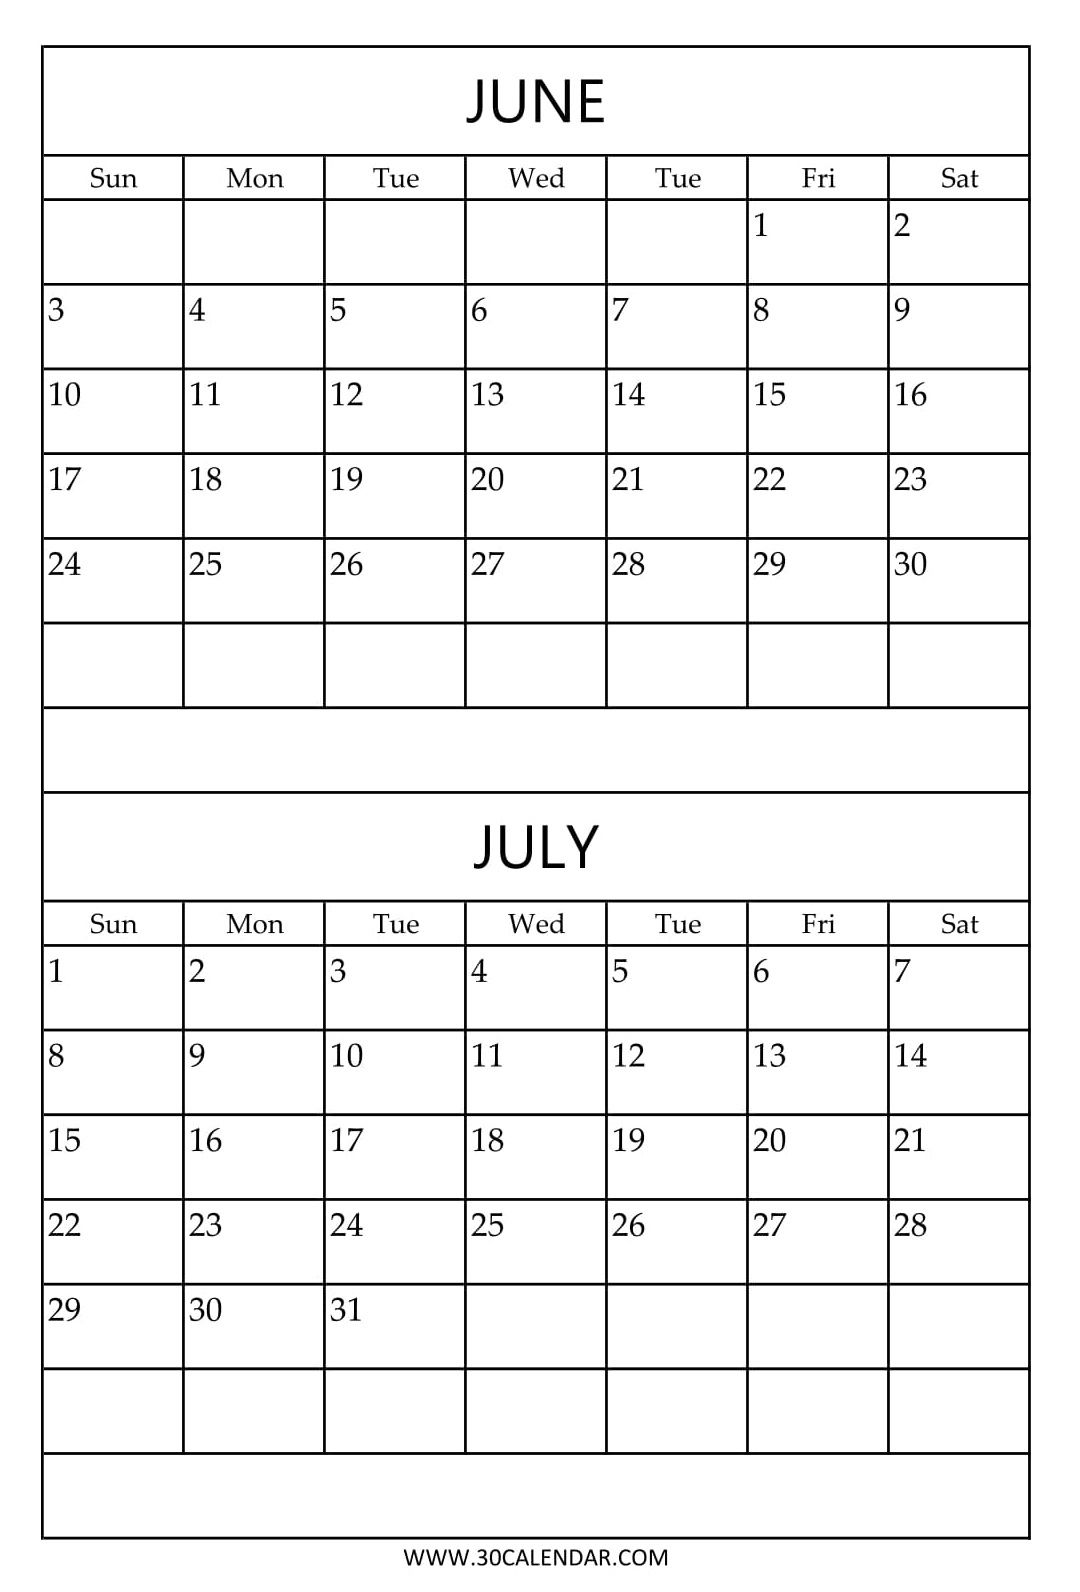 Free Printable June July Calendar Template July Calendar Calendar Template Calendar June